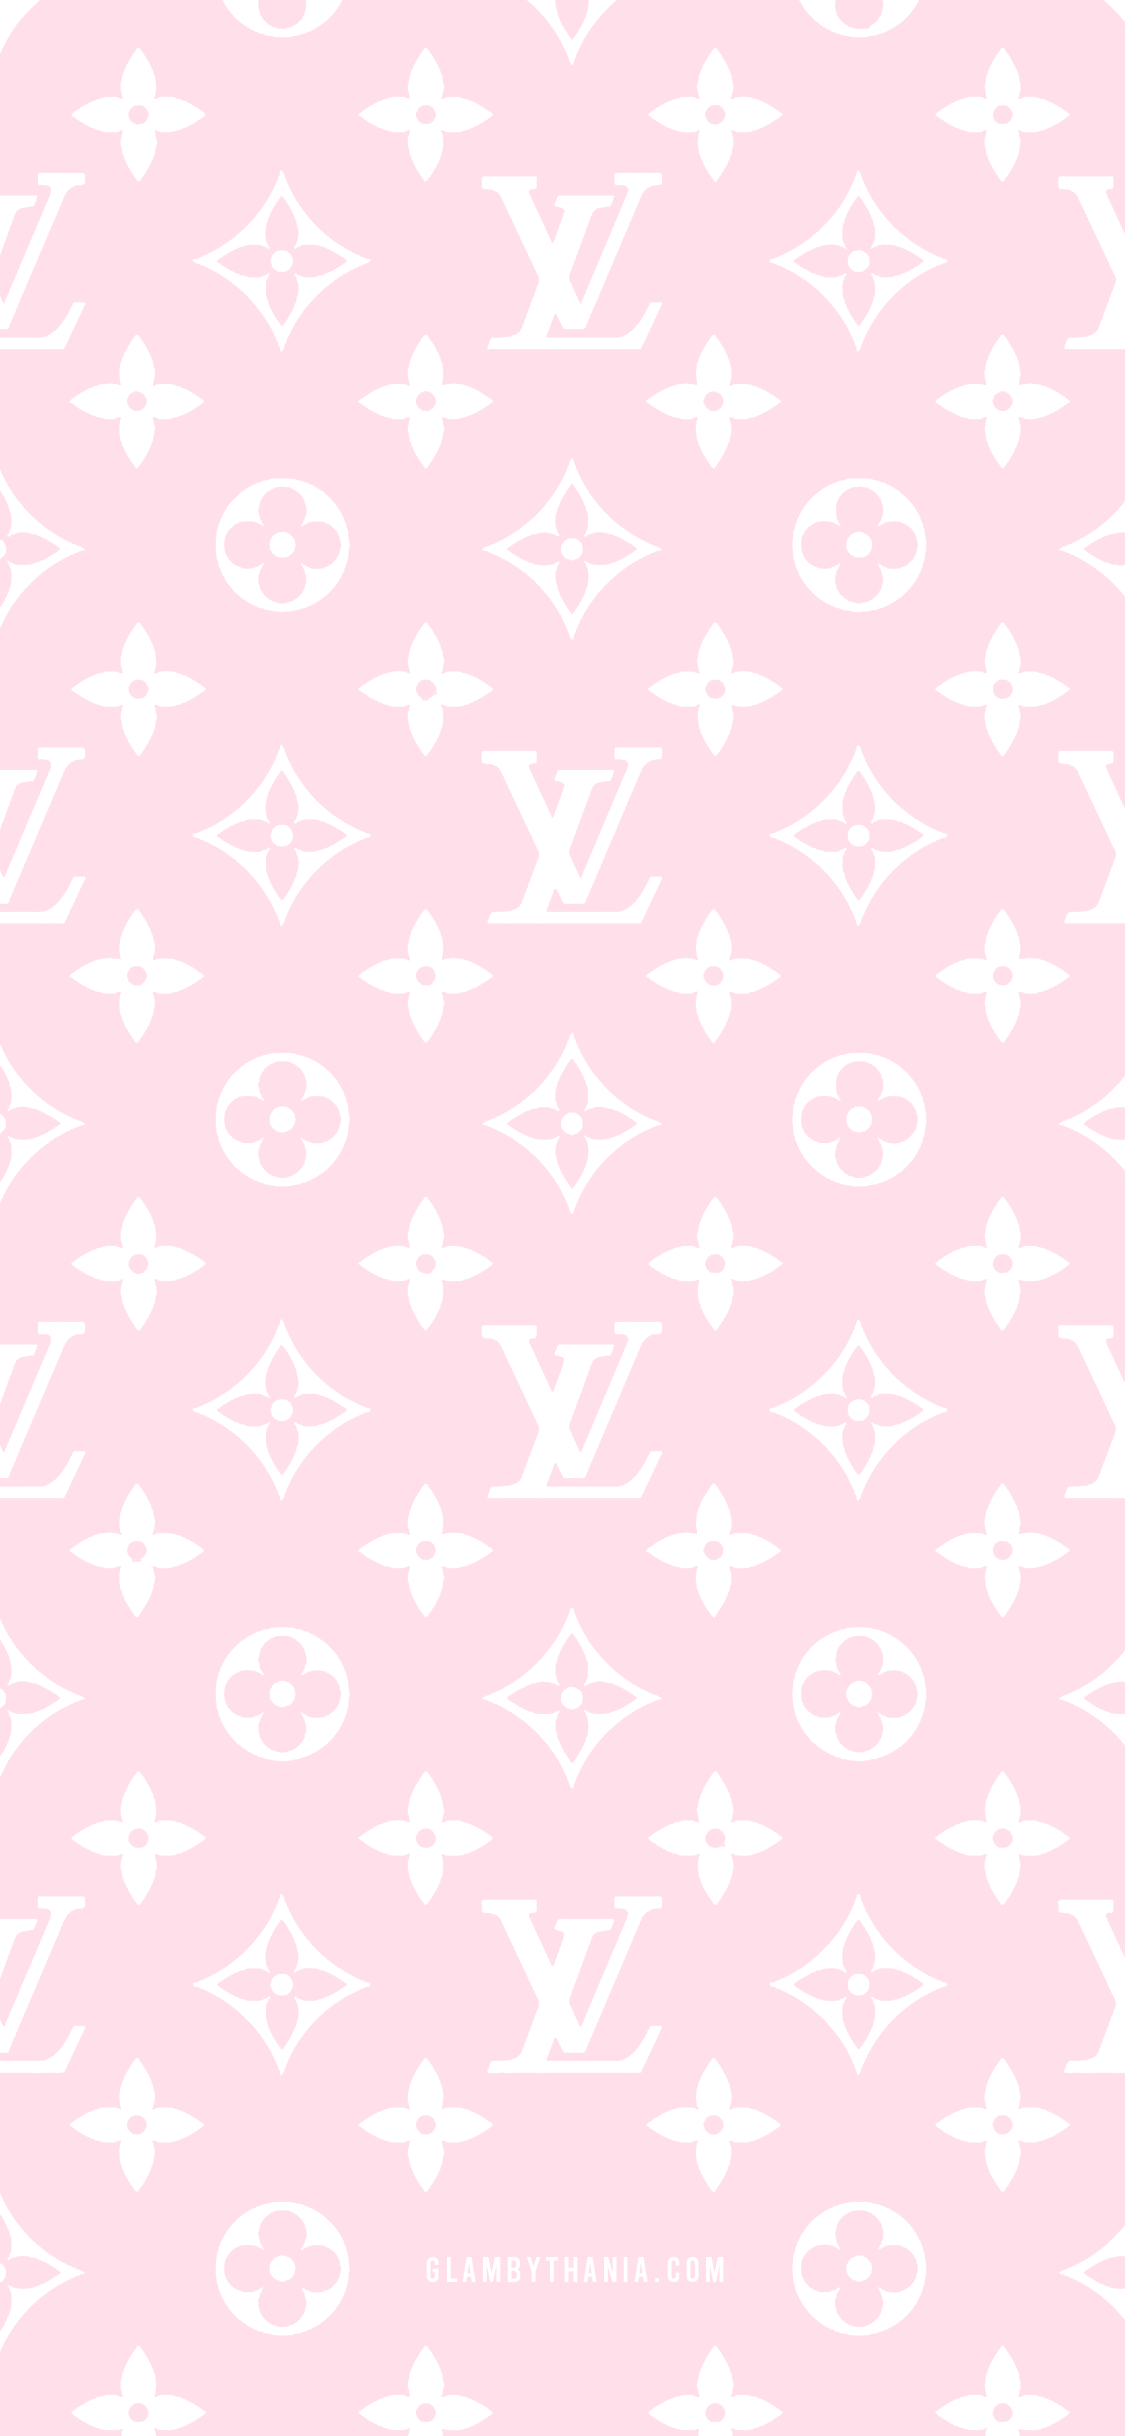 Free Designer Girly Pink Iphone Wallpapers Free Designer Girly Pink Iphone Wallpapers Cute Iphone Wallpaper Girly Pink Wallpaper Iphone Pink Wallpaper Girly